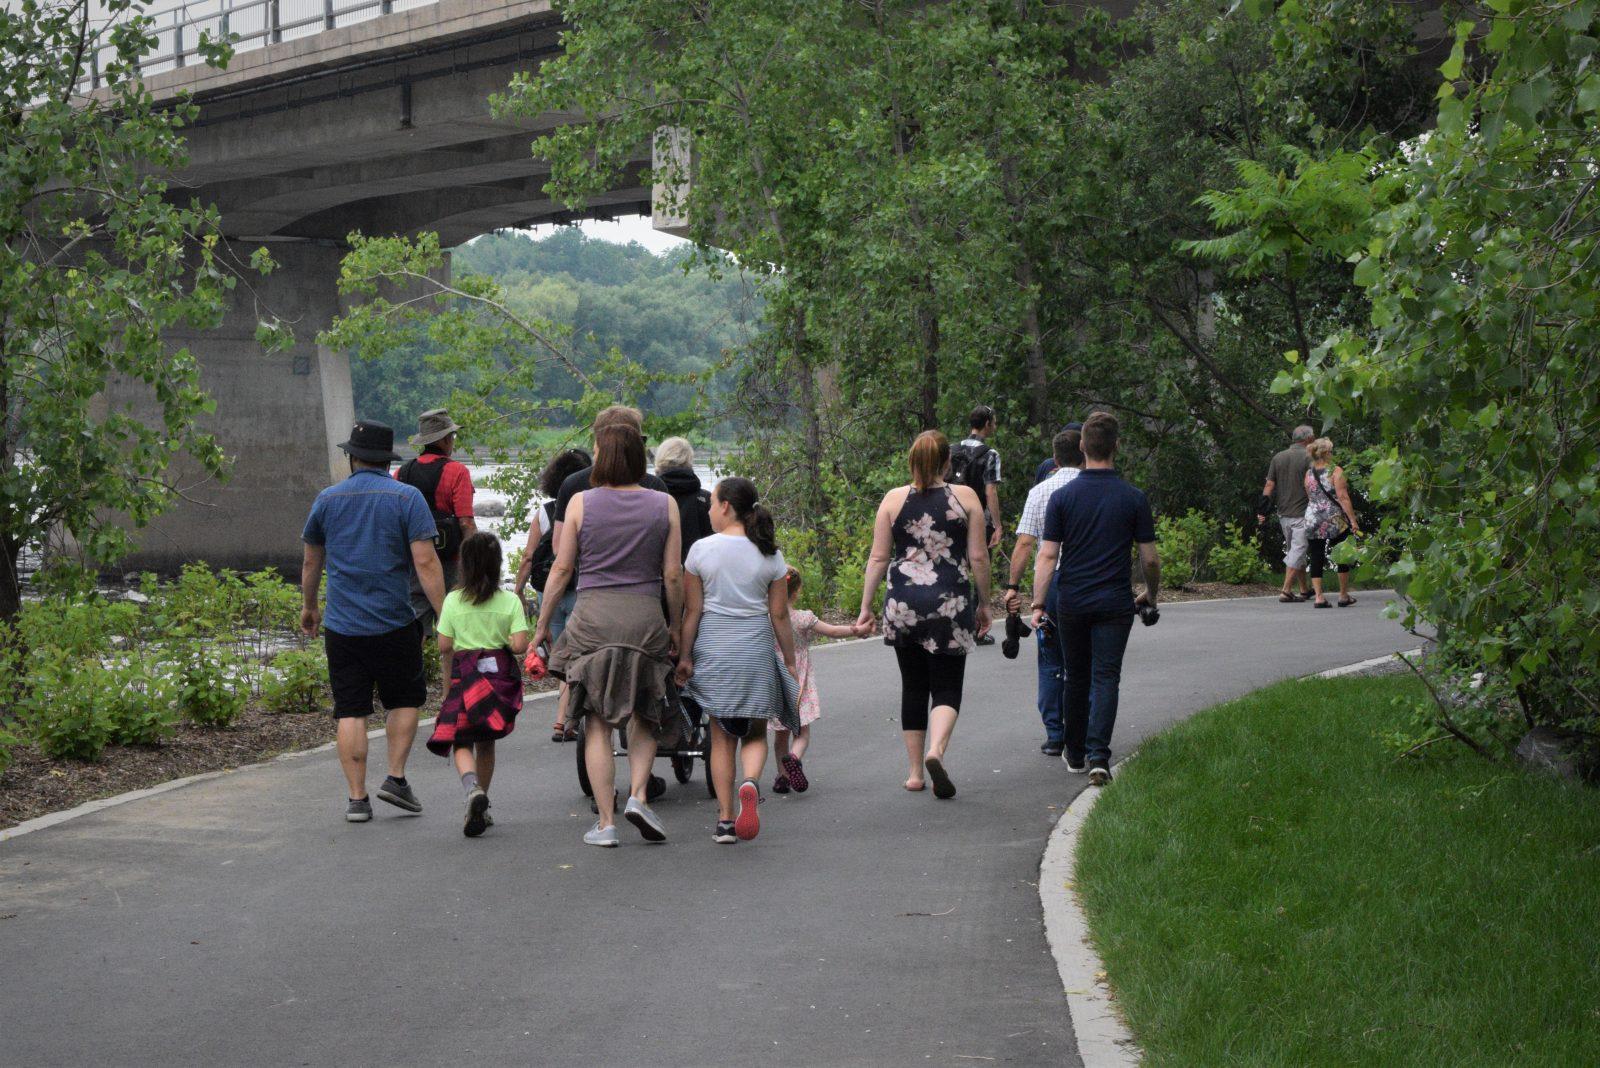 Le stationnement de la promenade Rivia sera inaccessible dès demain